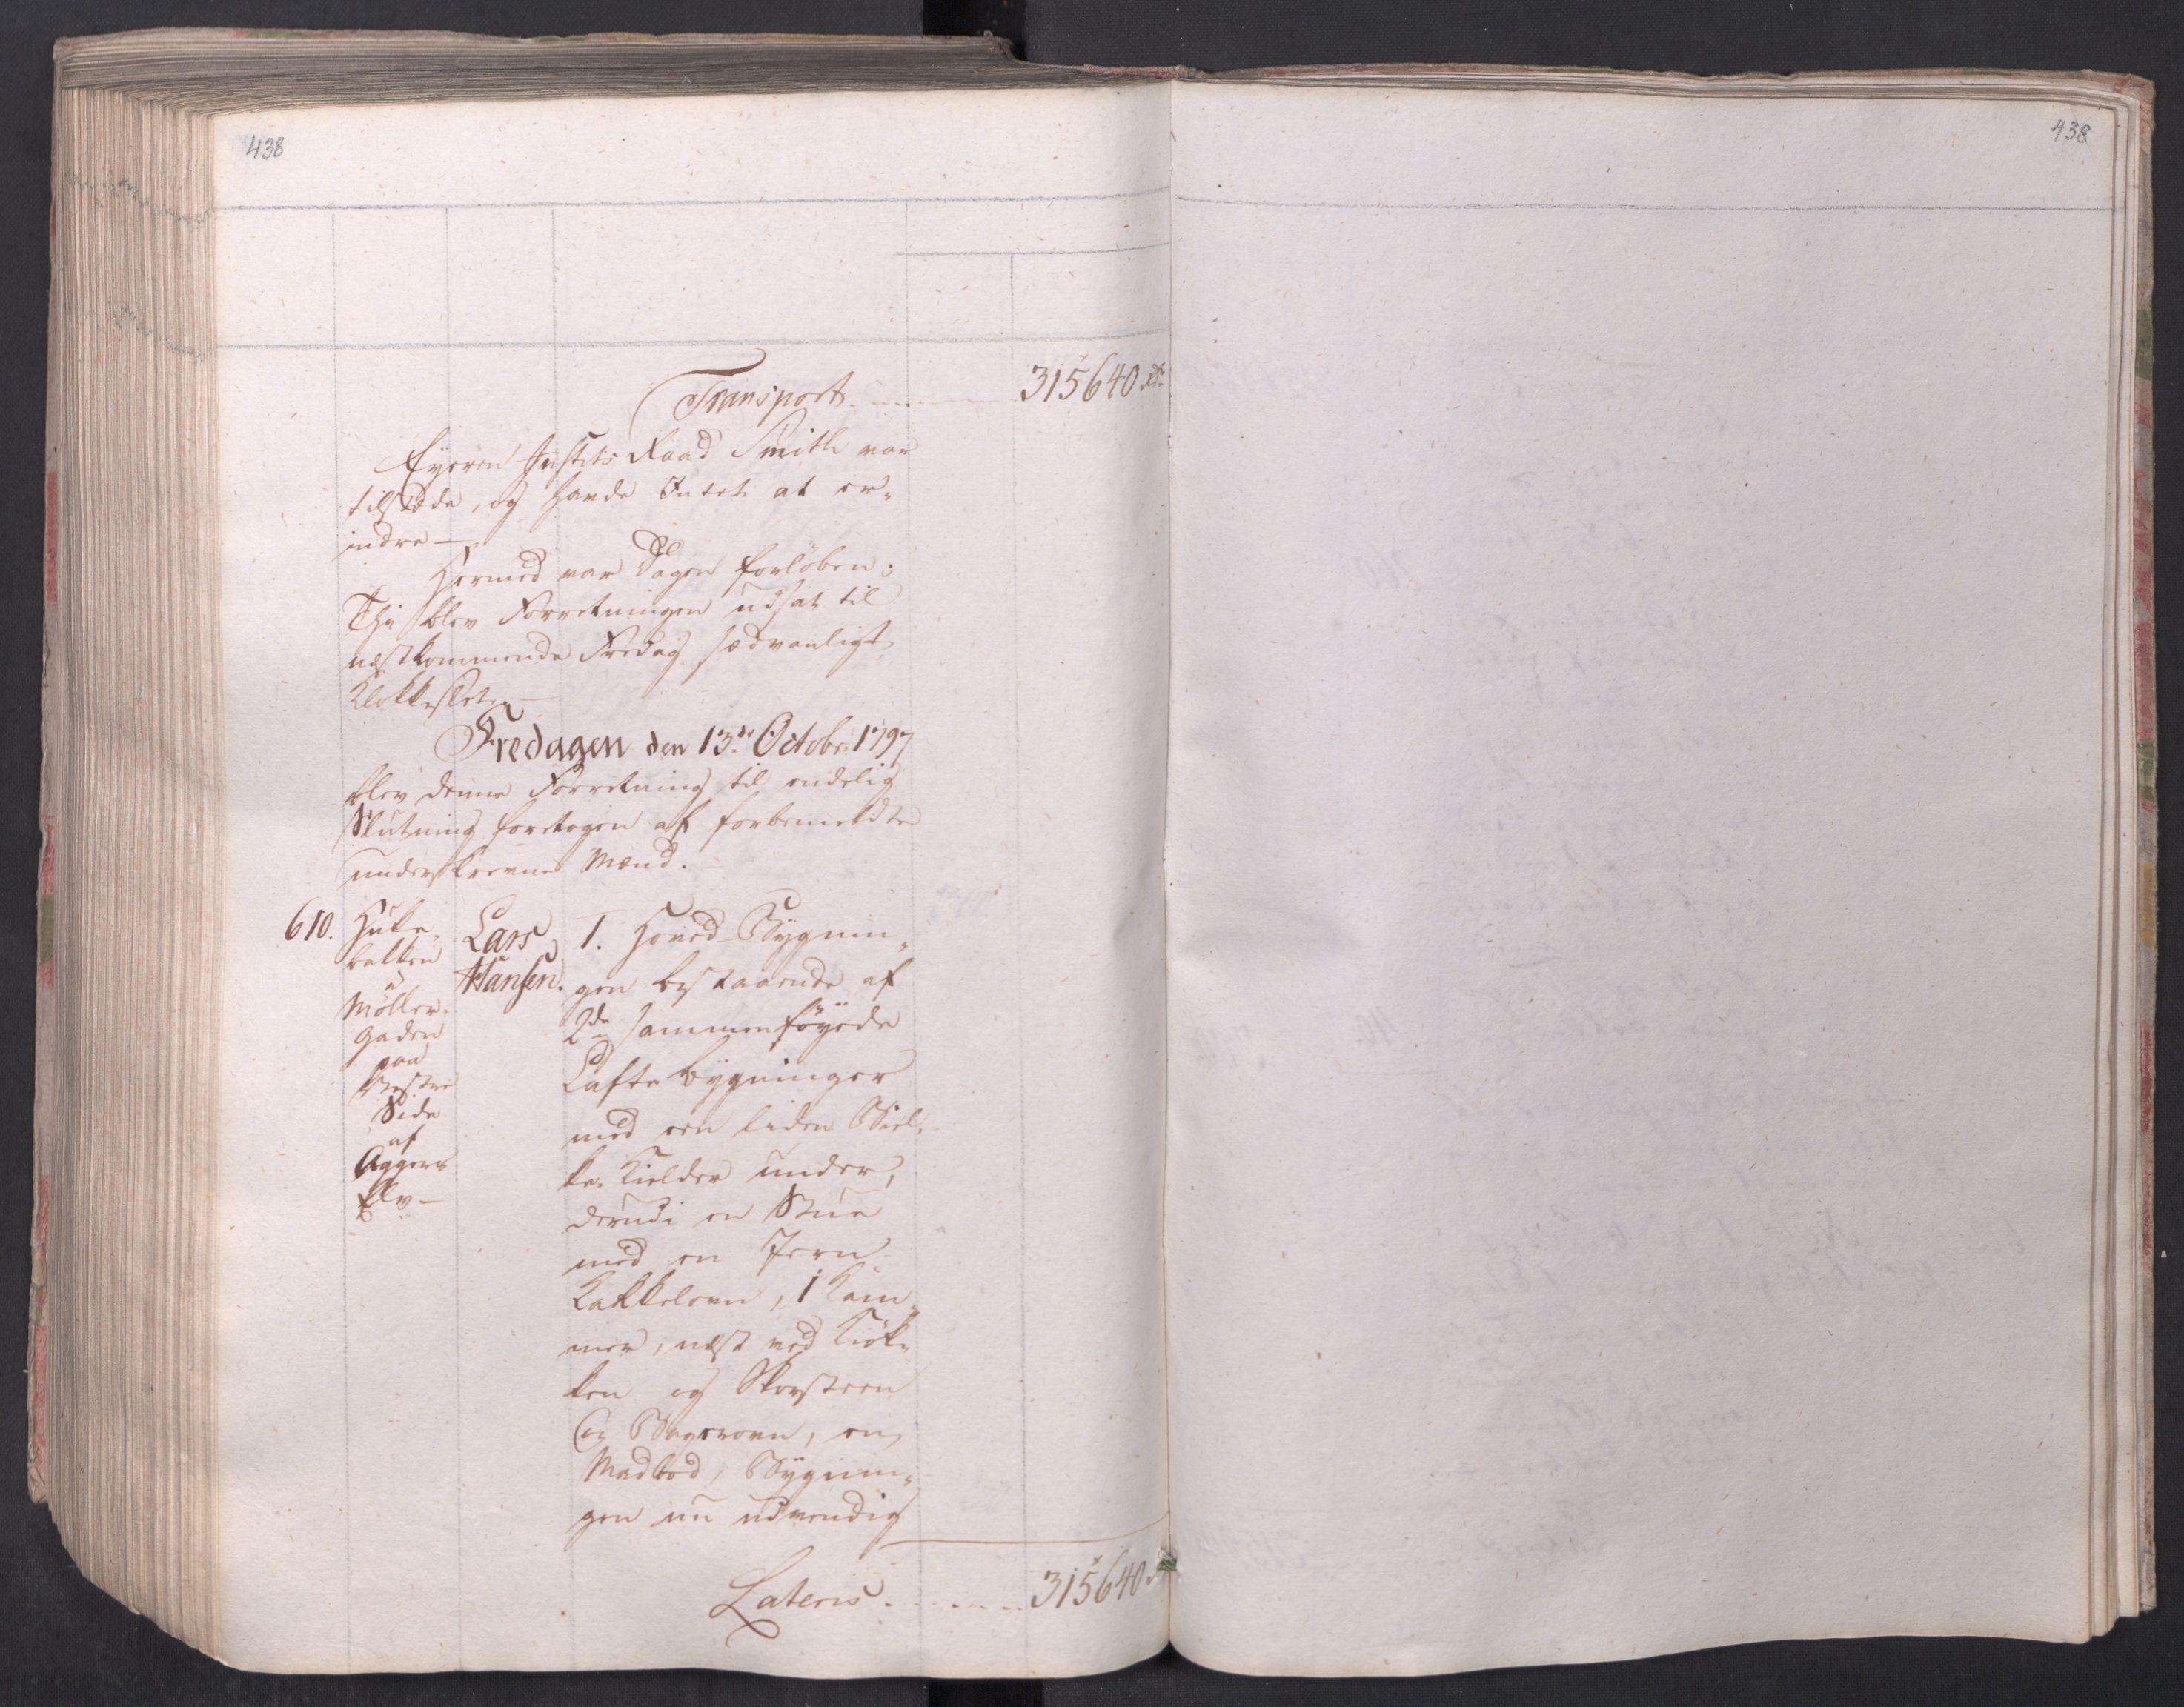 SAO, Kristiania stiftamt, I/Ia/L0015: Branntakster, 1797, s. 438